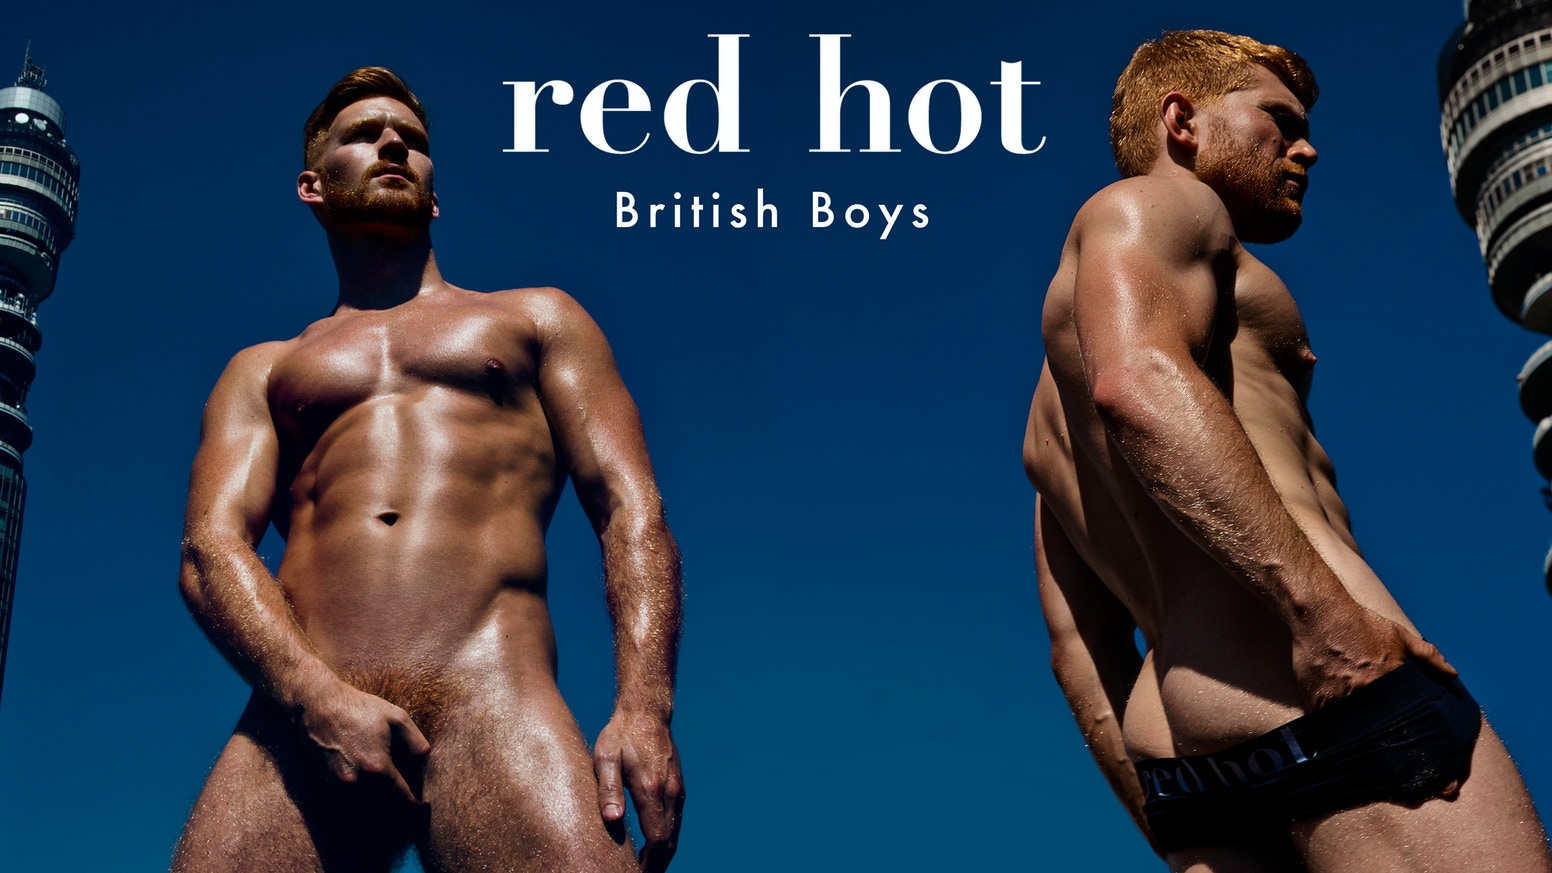 Hot naked redheads men — 10